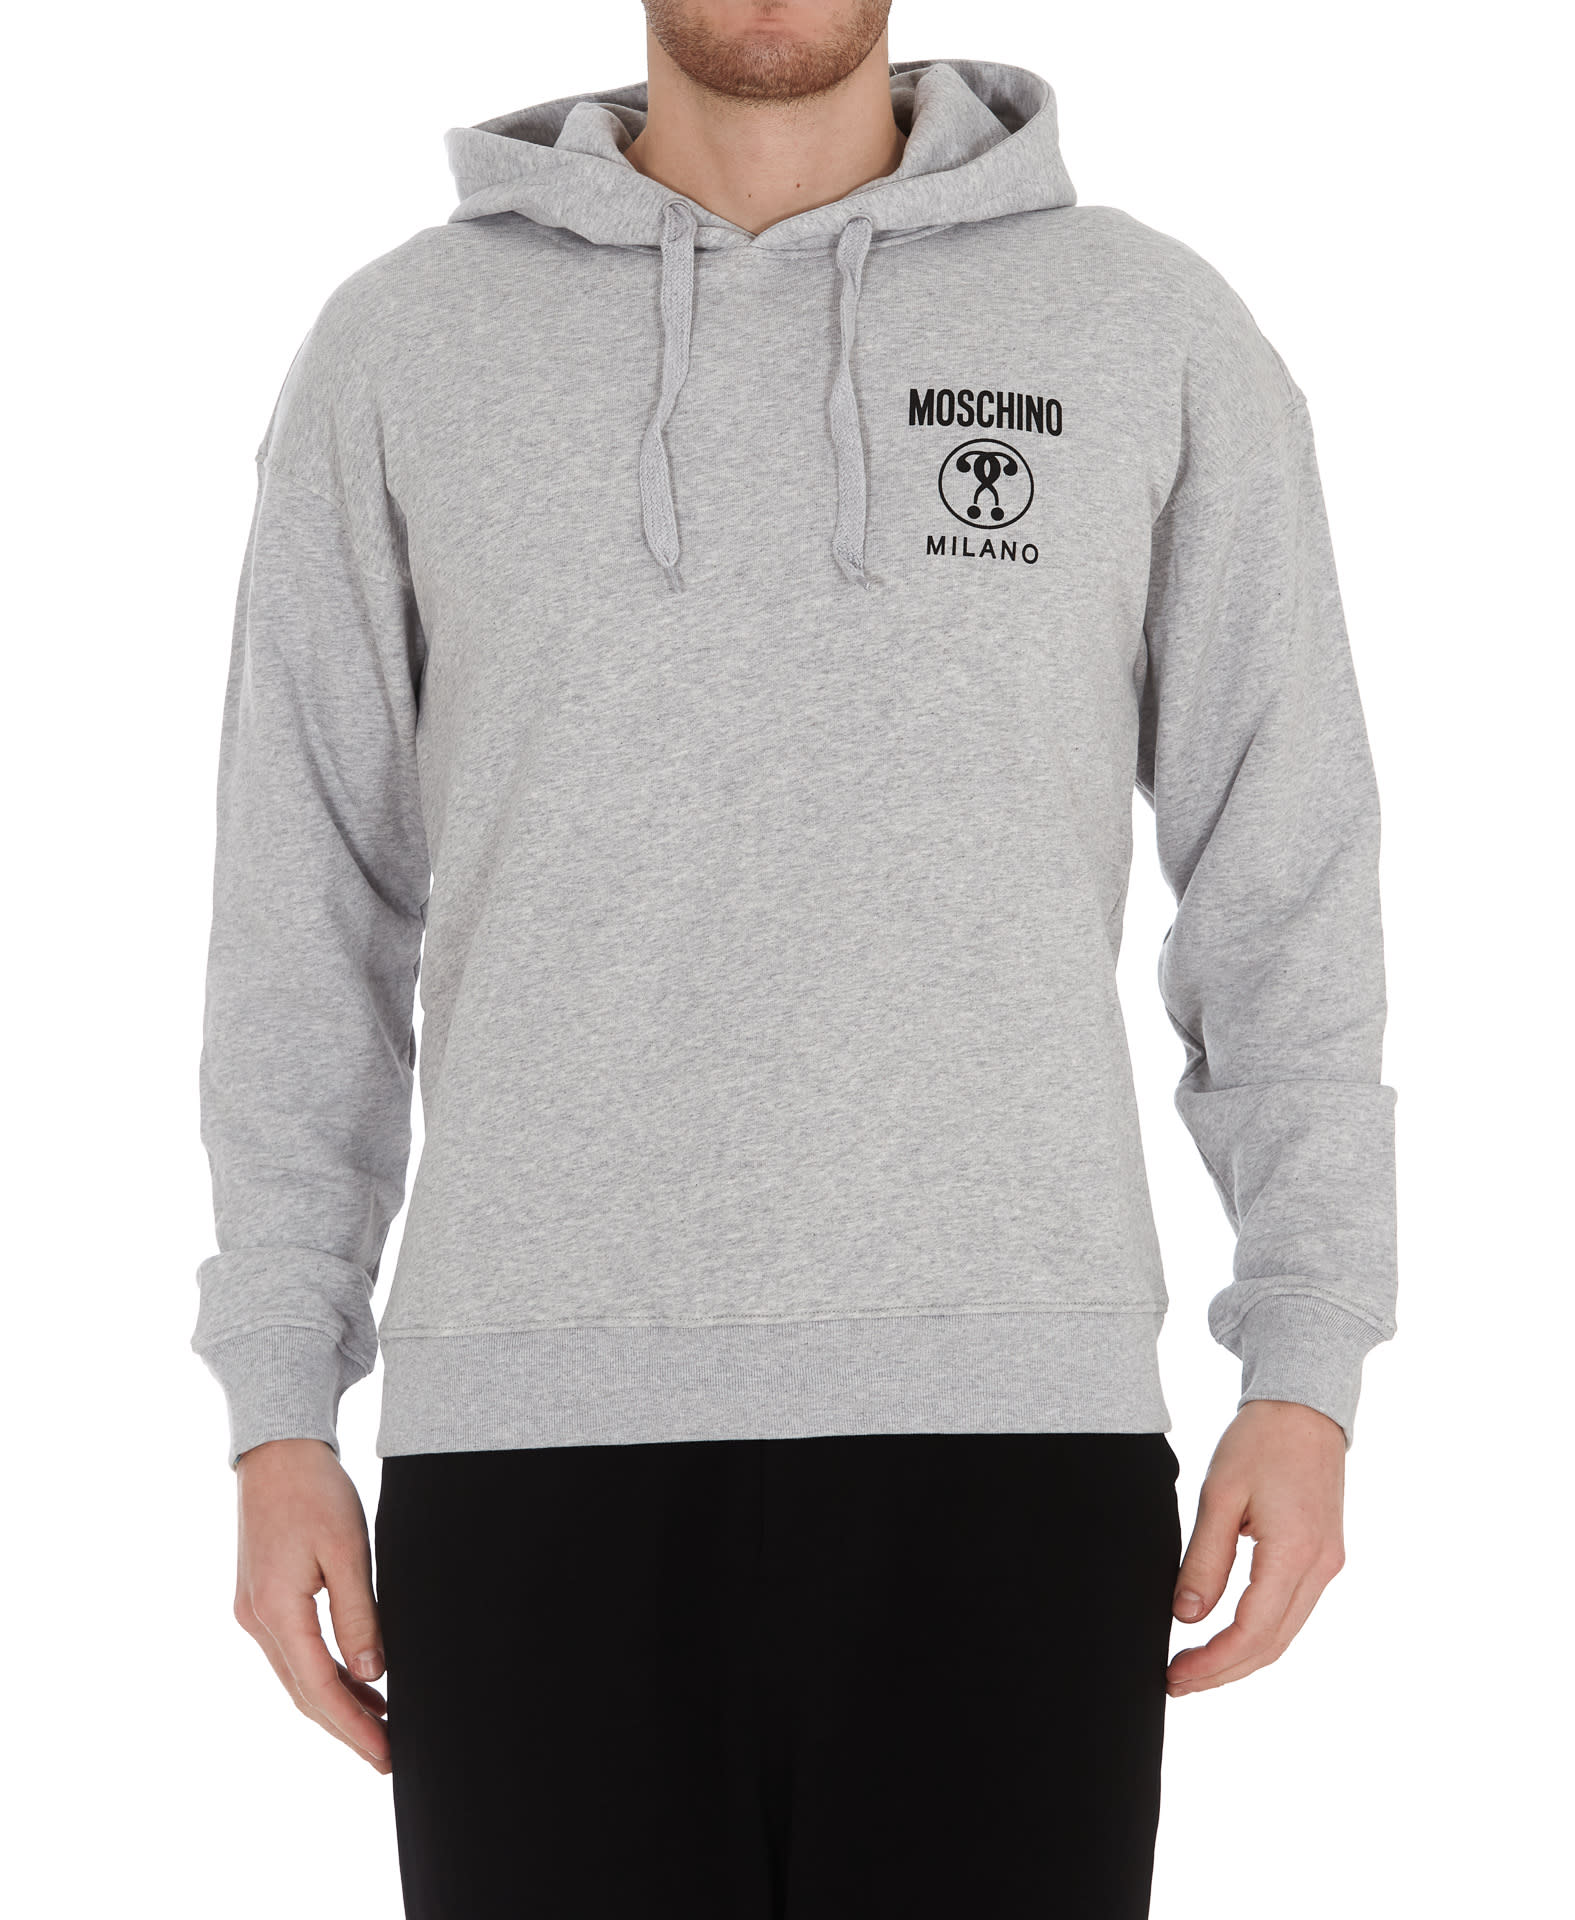 Moschino Logo Hoodie In Grey